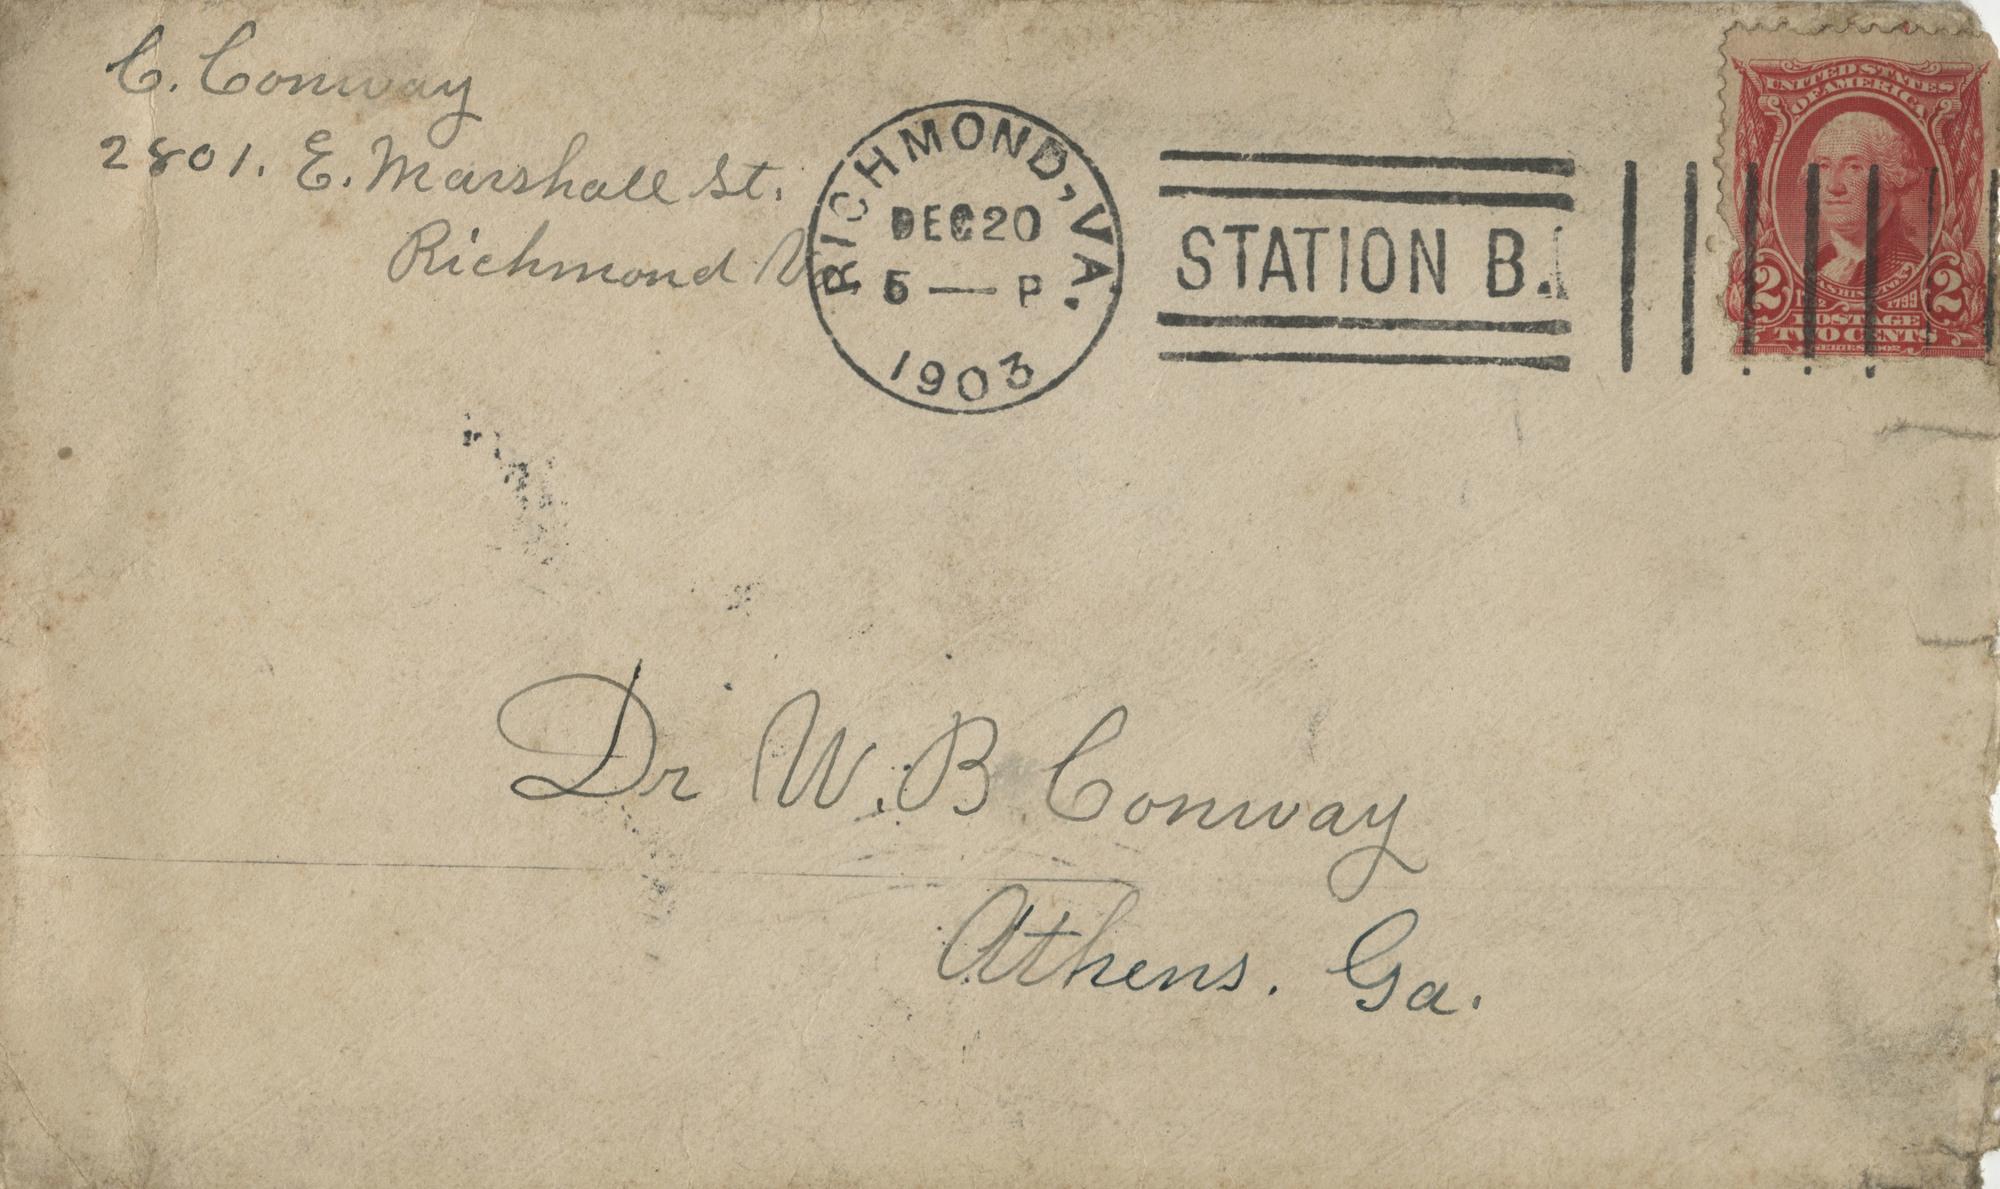 http://spec.lib.vt.edu/pickup/Omeka_upload/Ms2012-039_ConwayCatlett_F4_Letter_1903_1219_enva.jpg